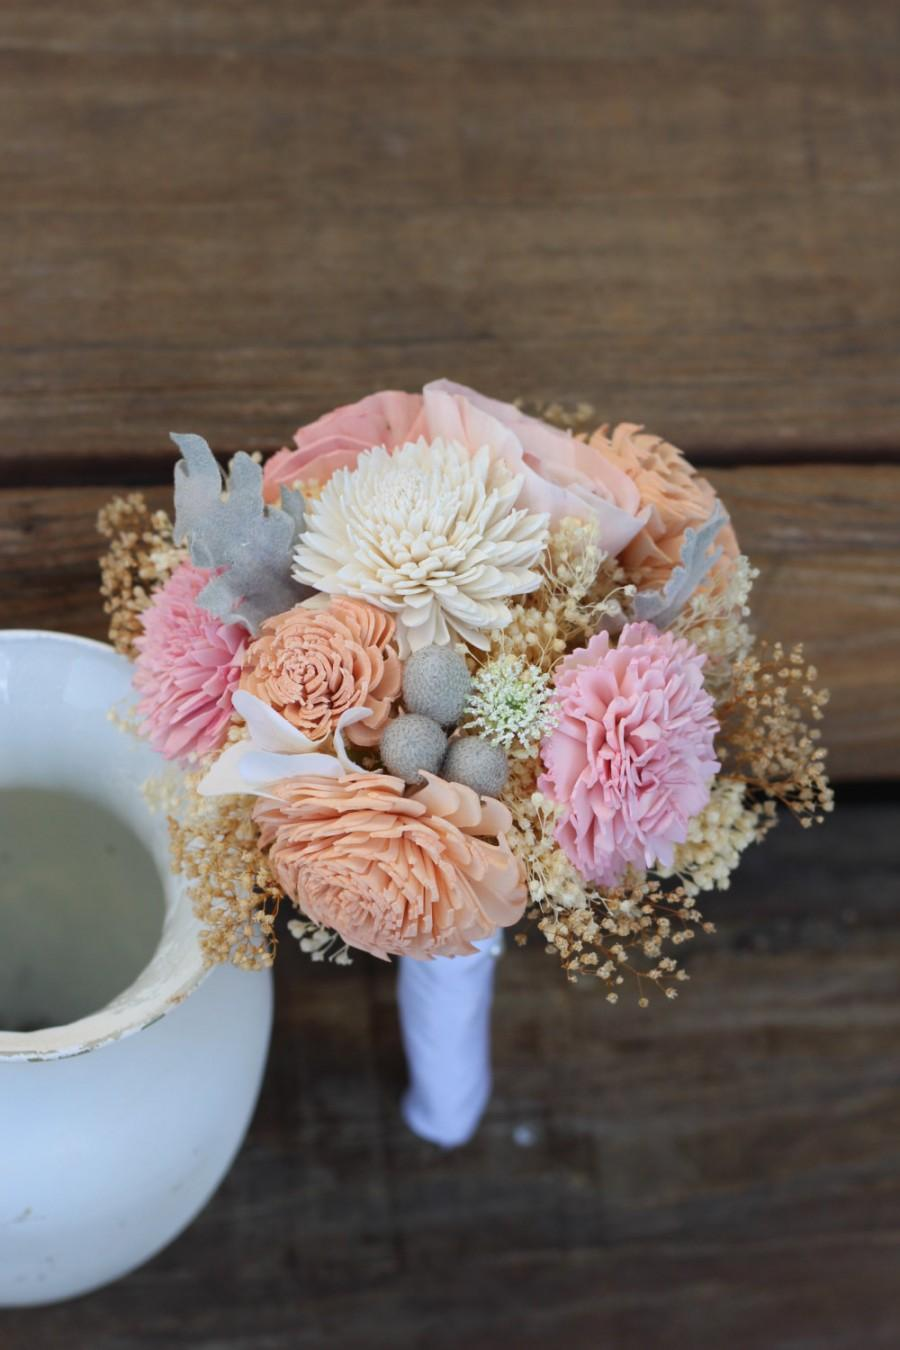 Mariage - Pink Peach bouquet, wedding bouquet, bridal bouquet, bridesmaid bouquet, alternative bouquet